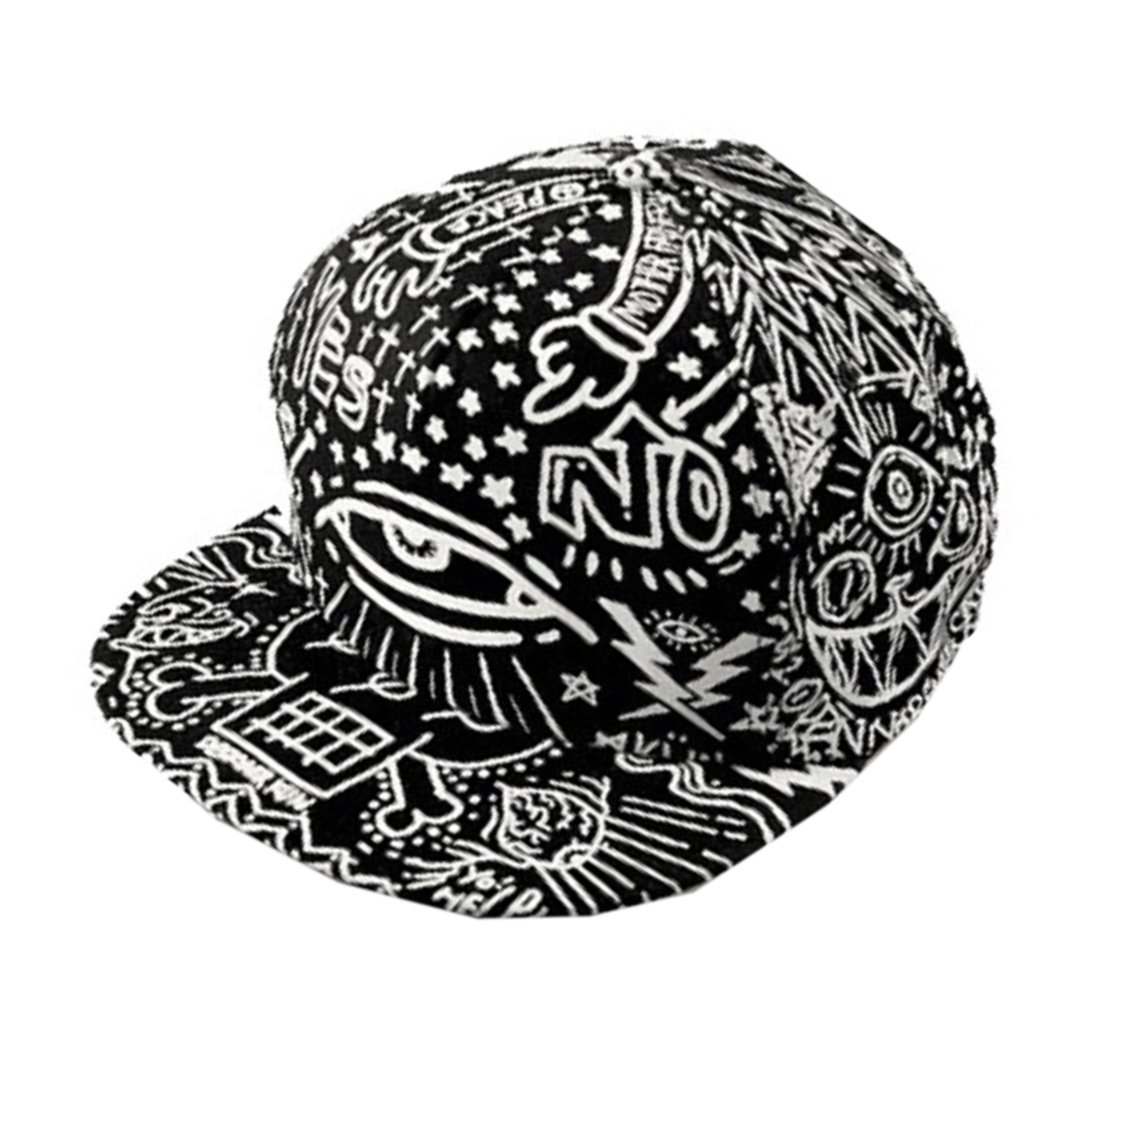 8764601b7f1 Baseball Cap Adjustable baseball cap women black cap for women caps for  teen boys men caps and hats caps snapback cap for women caps for teen girl  women ...